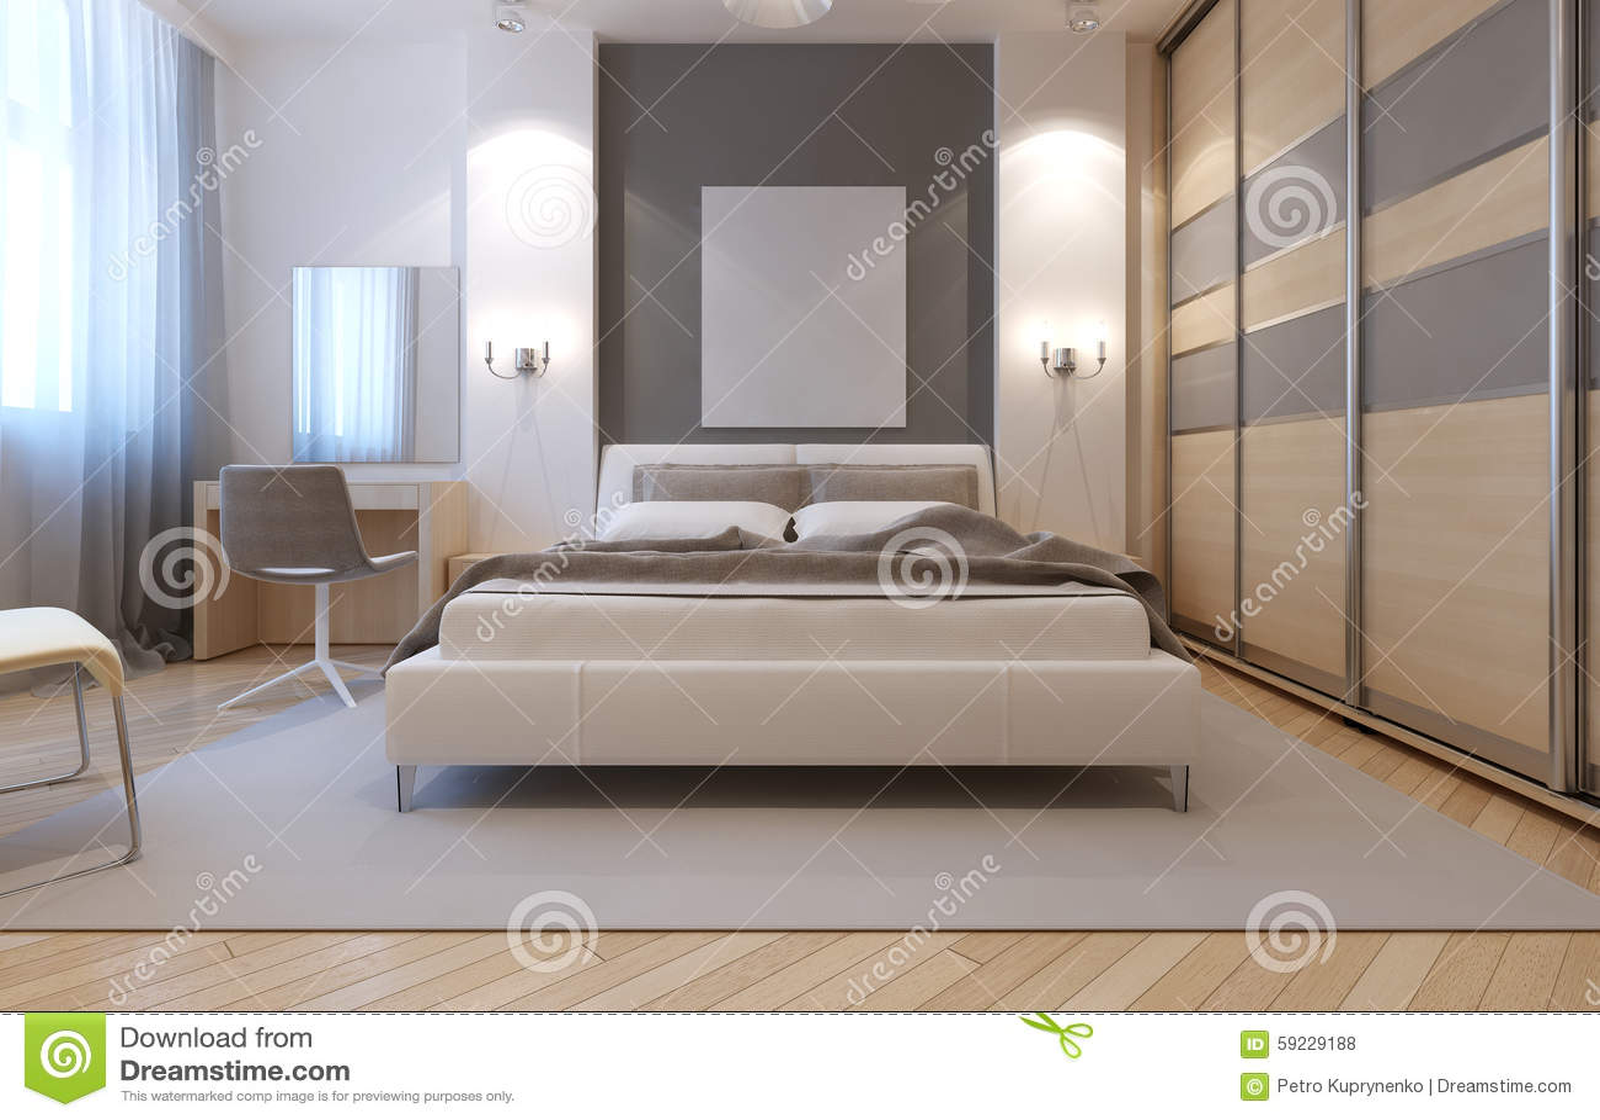 Master Bedroom Avangard Design Stock Illustration Illustration Of